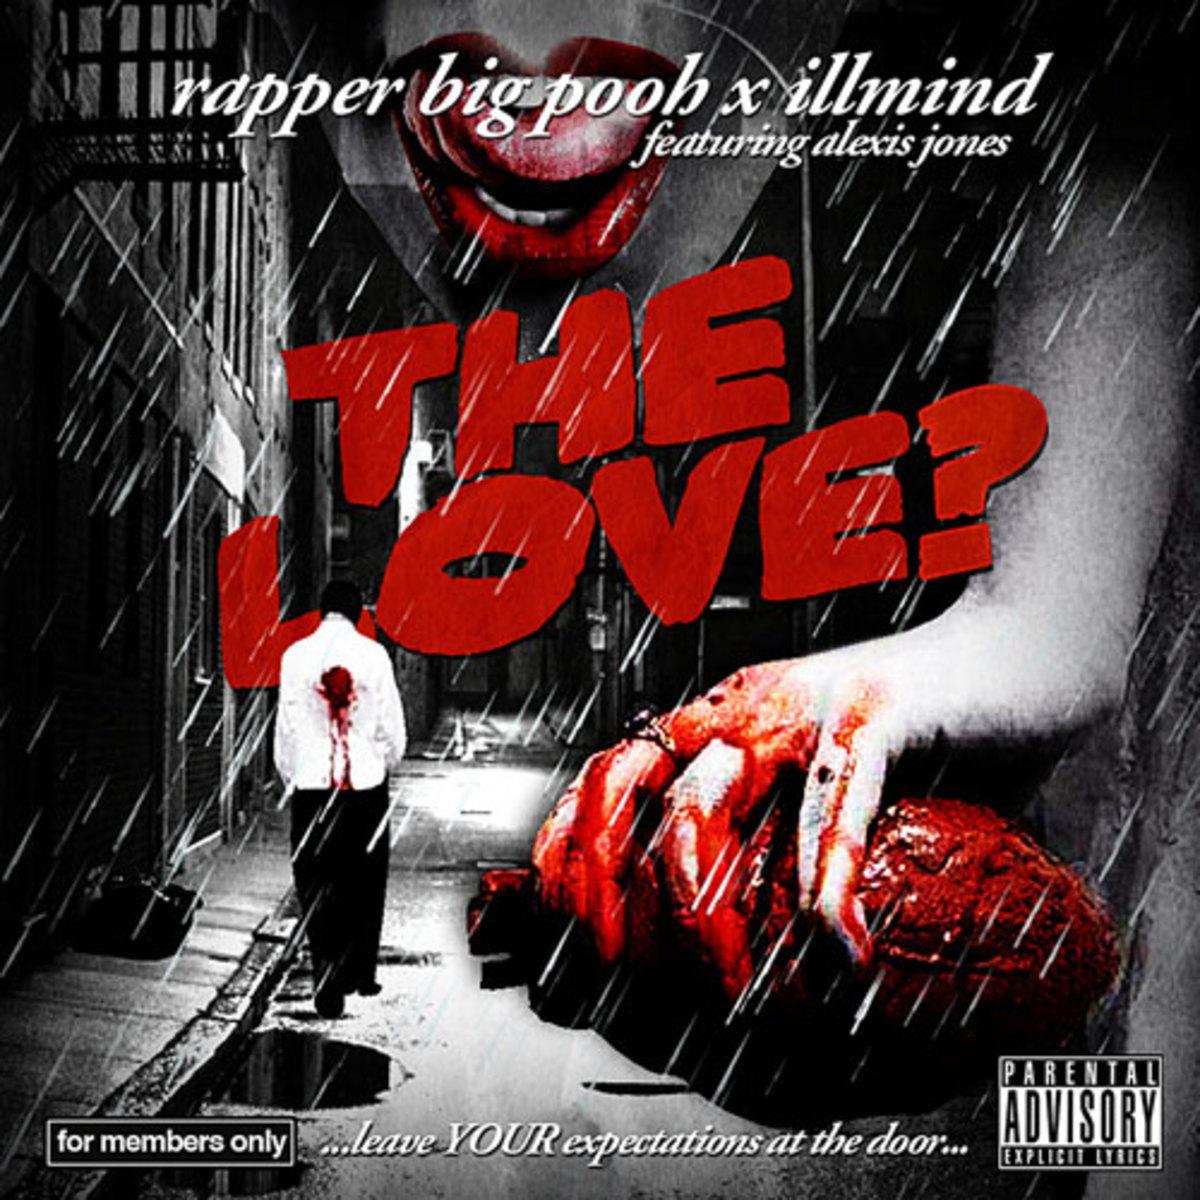 rapperbigpooh-thelove.jpg